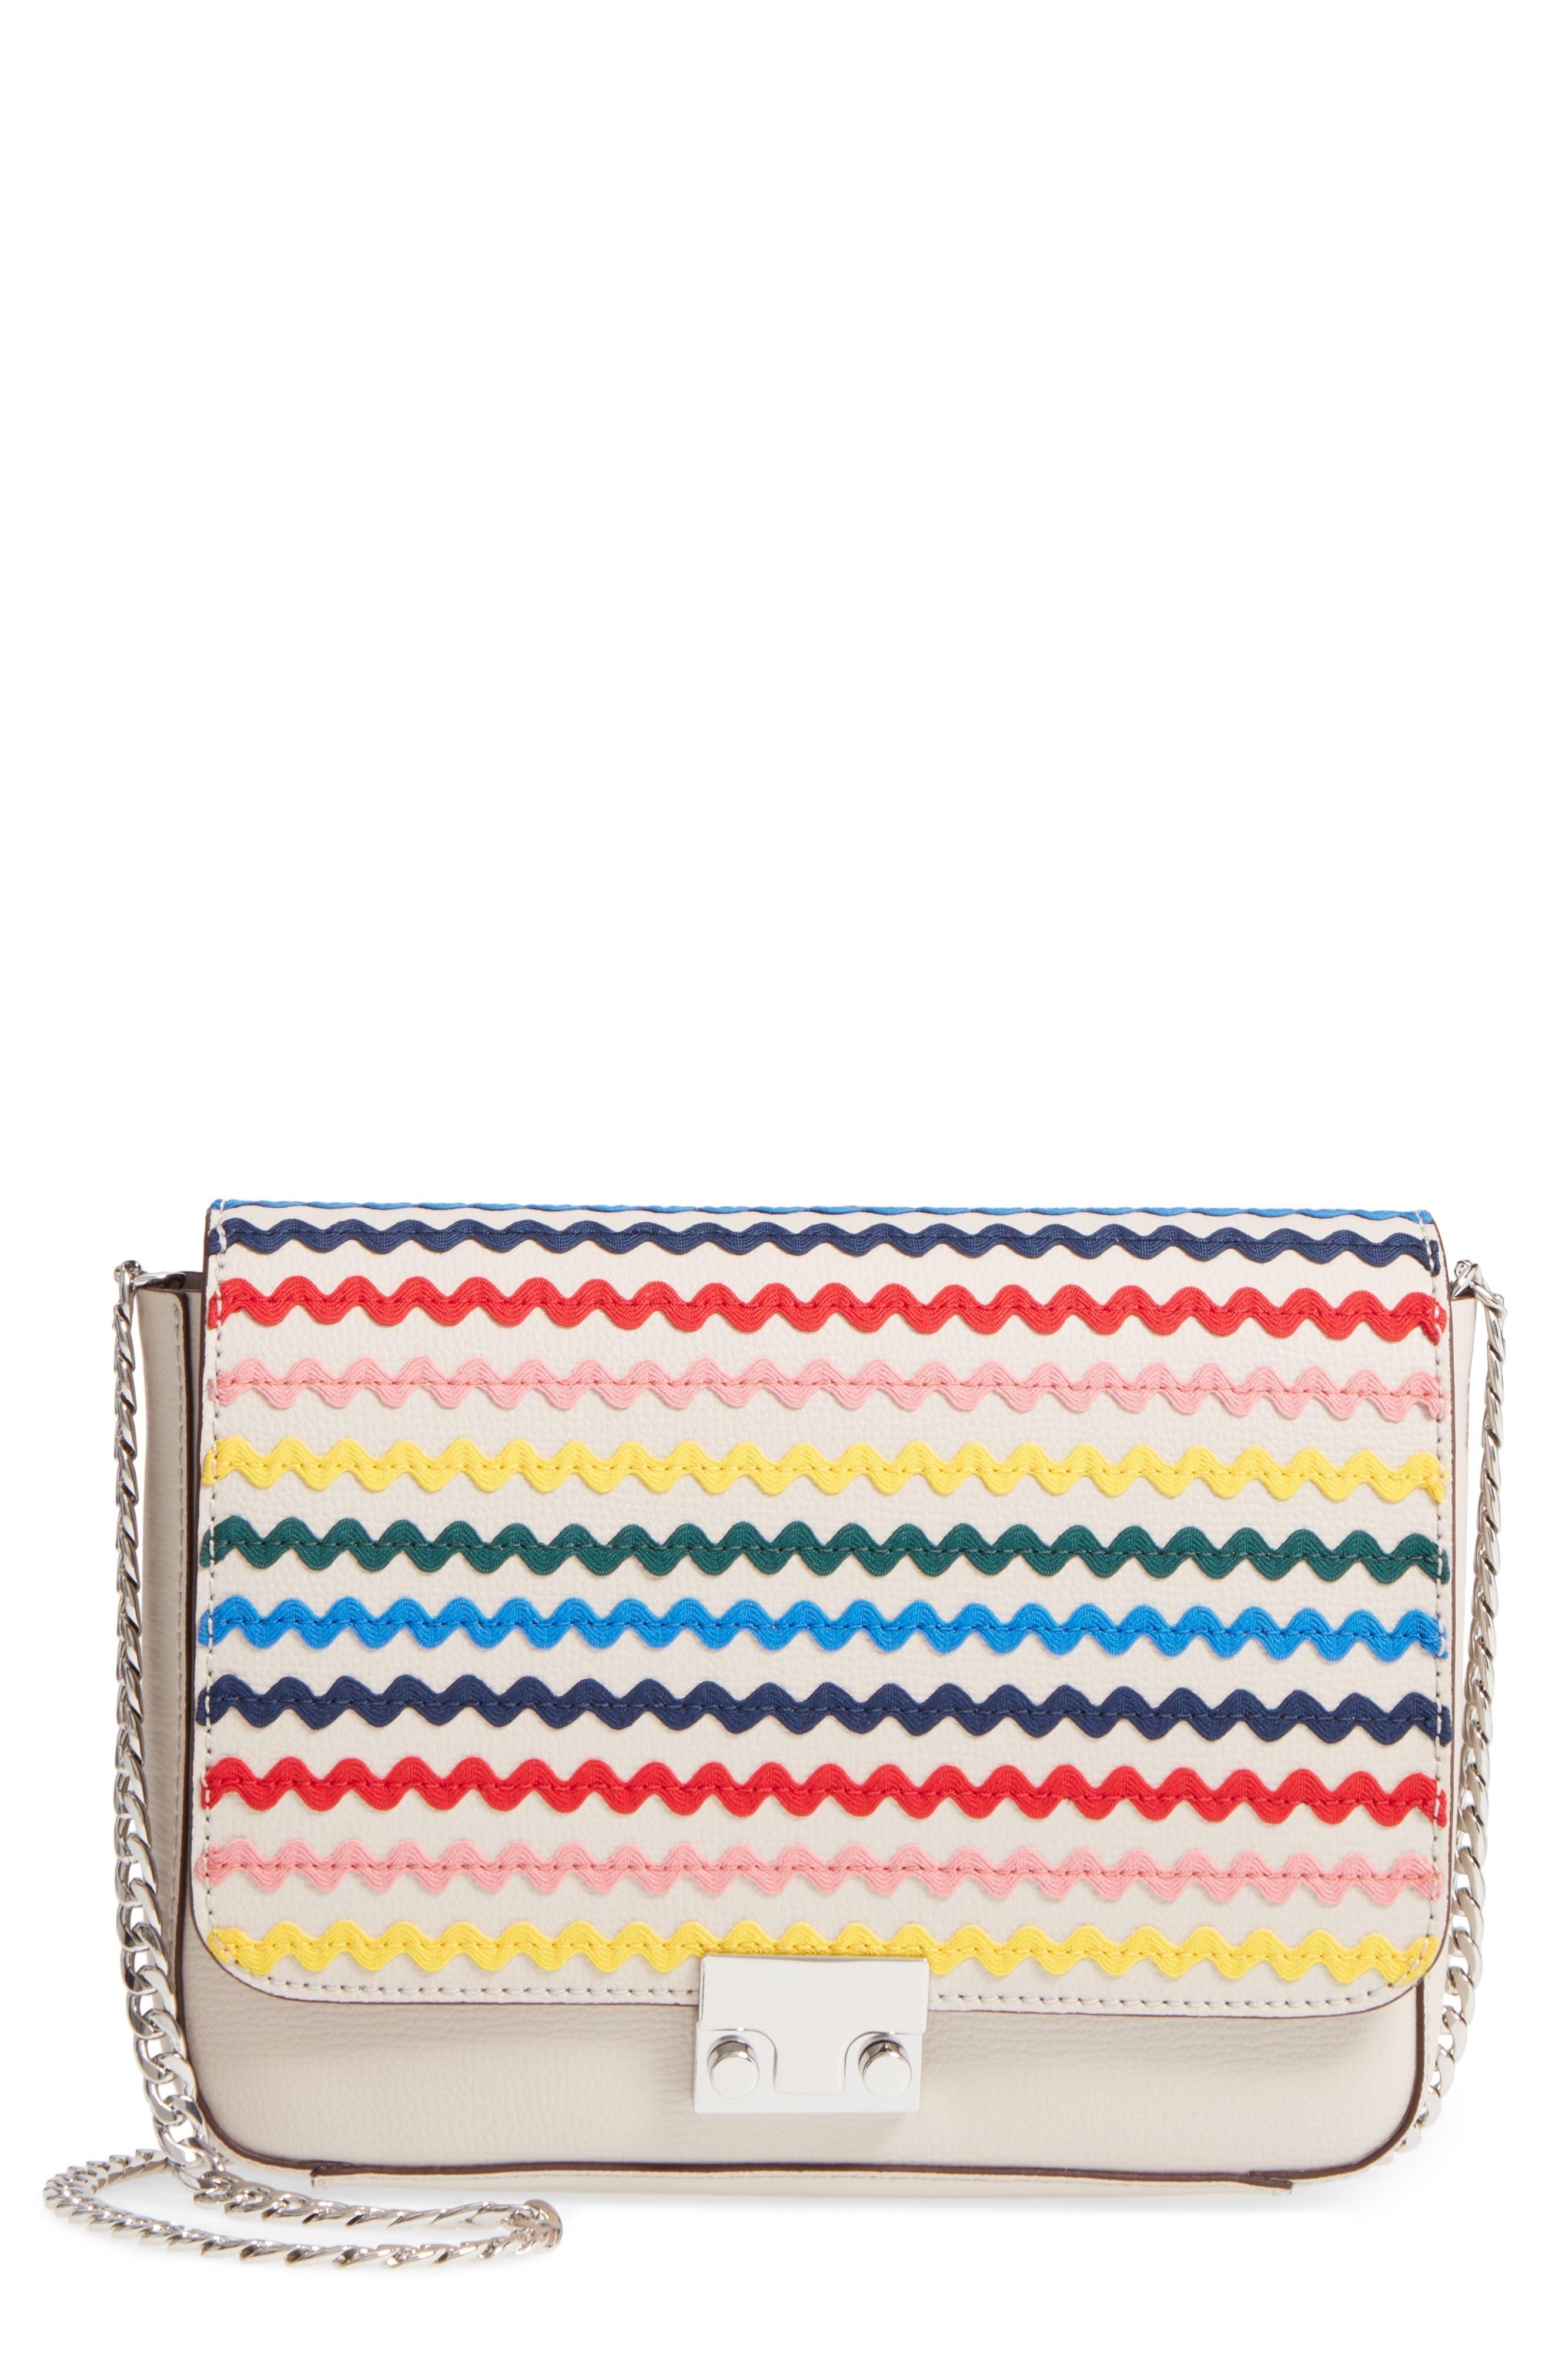 Lock Leather Flap Clutch/Shoulder Bag,                             Main thumbnail 1, color,                             Stone/ Rainbow